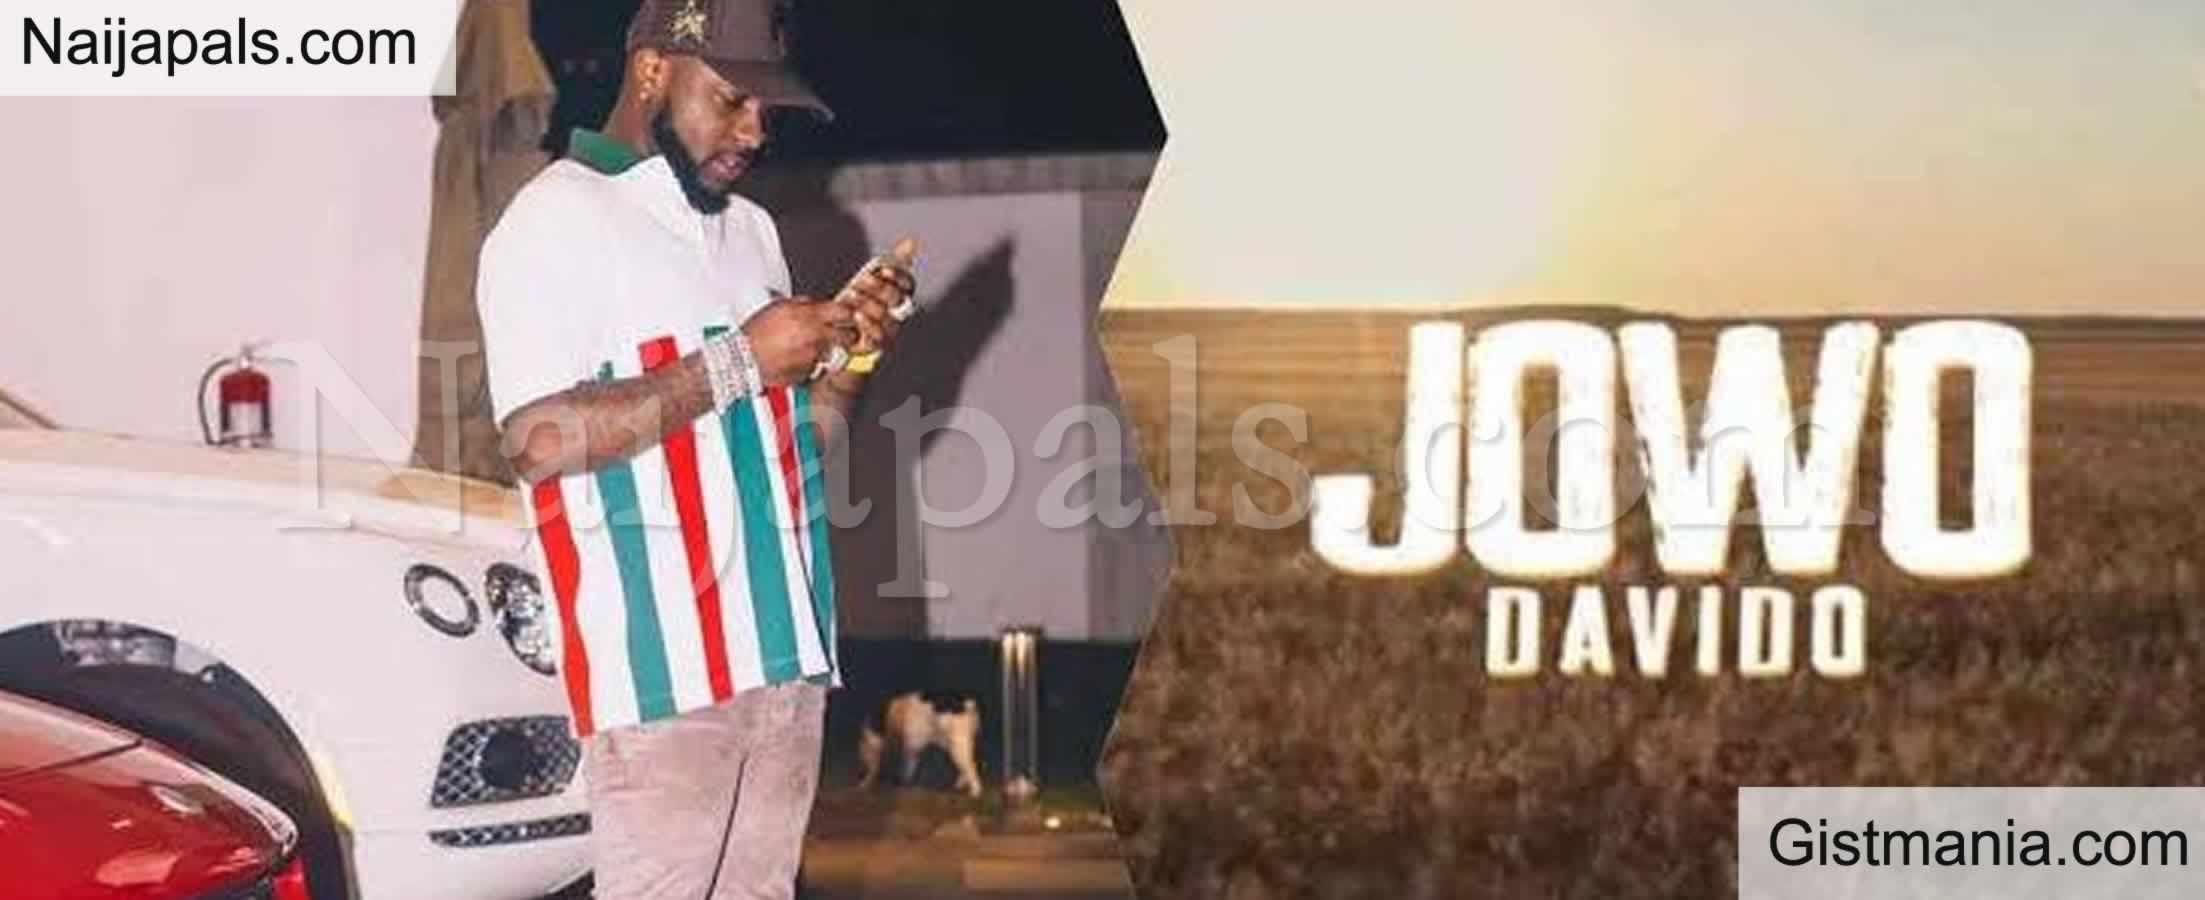 "<img alt='.' class='lazyload' data-src='https://img.gistmania.com/emot/dance.gif' /><img alt='.' class='lazyload' data-src='https://img.gistmania.com/emot/thumbs_up.gif' /> <b>My God Is Working"" – Nigerian Singer, Davido Celebrates As 'Jowo' Hits Over 25M Views On Youtube</b>"